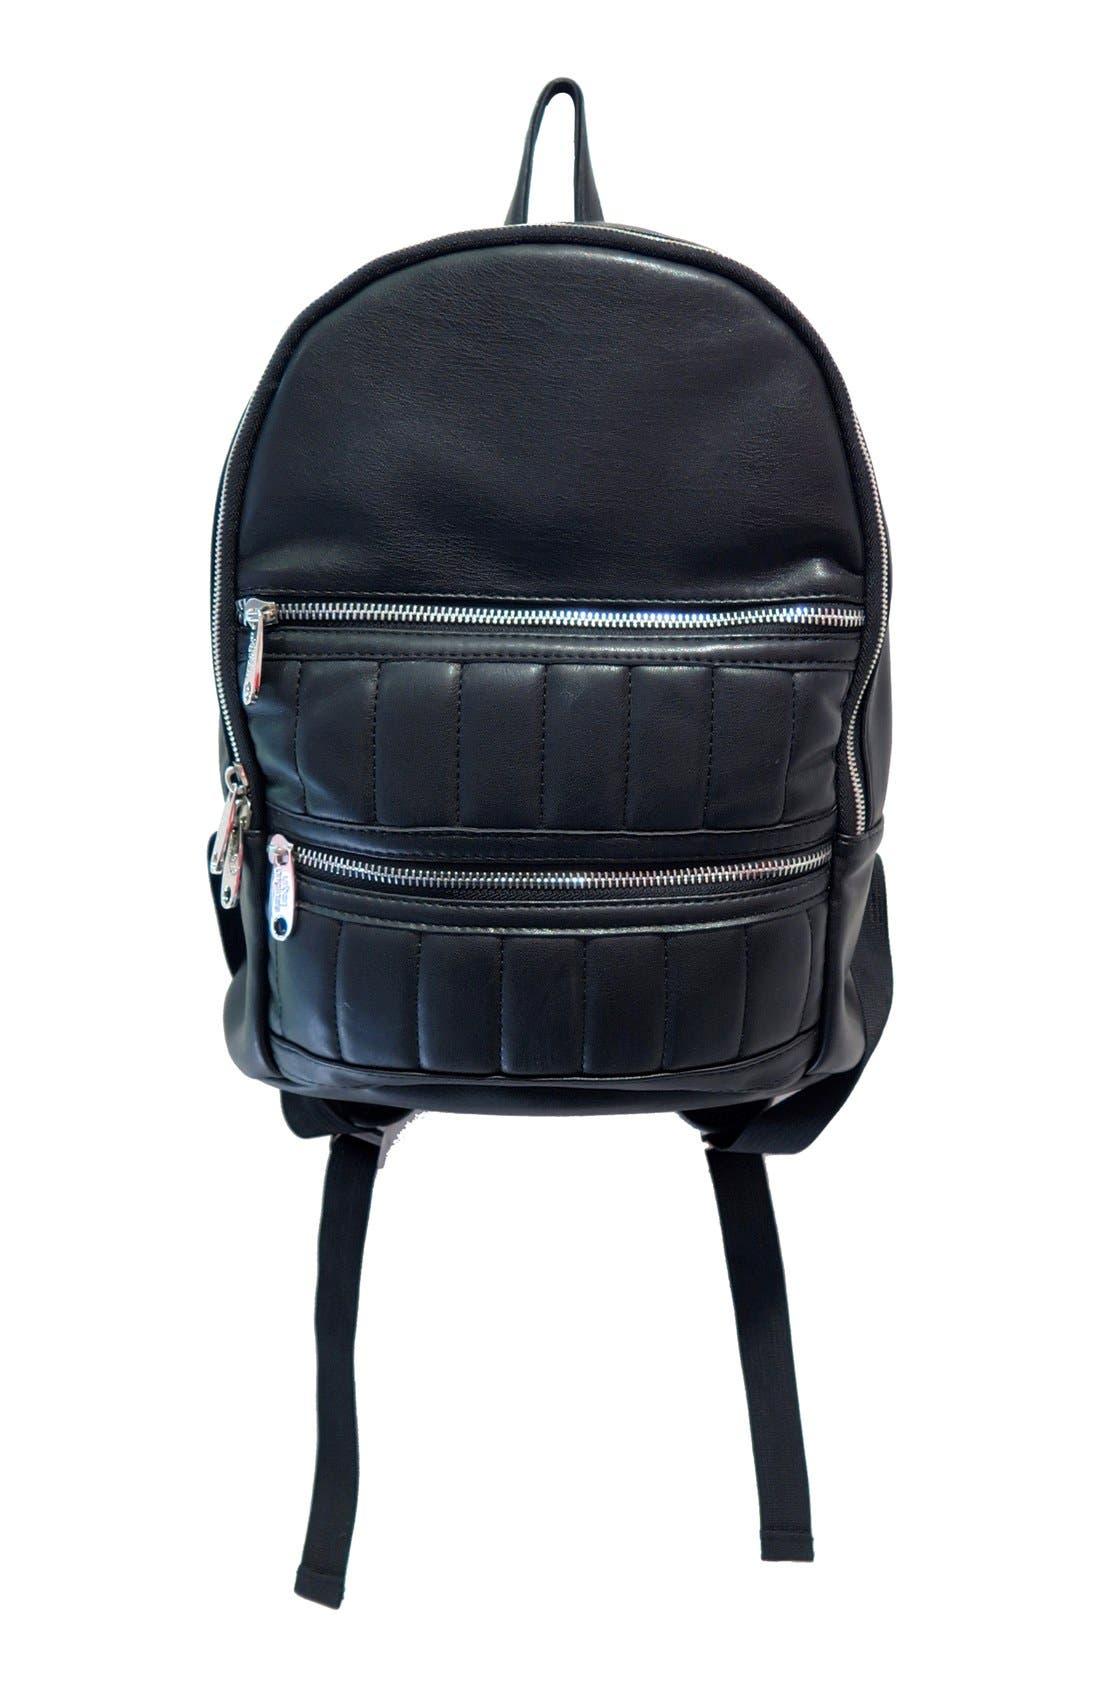 Main Image - Urban Originals 'Clued Up' Backpack